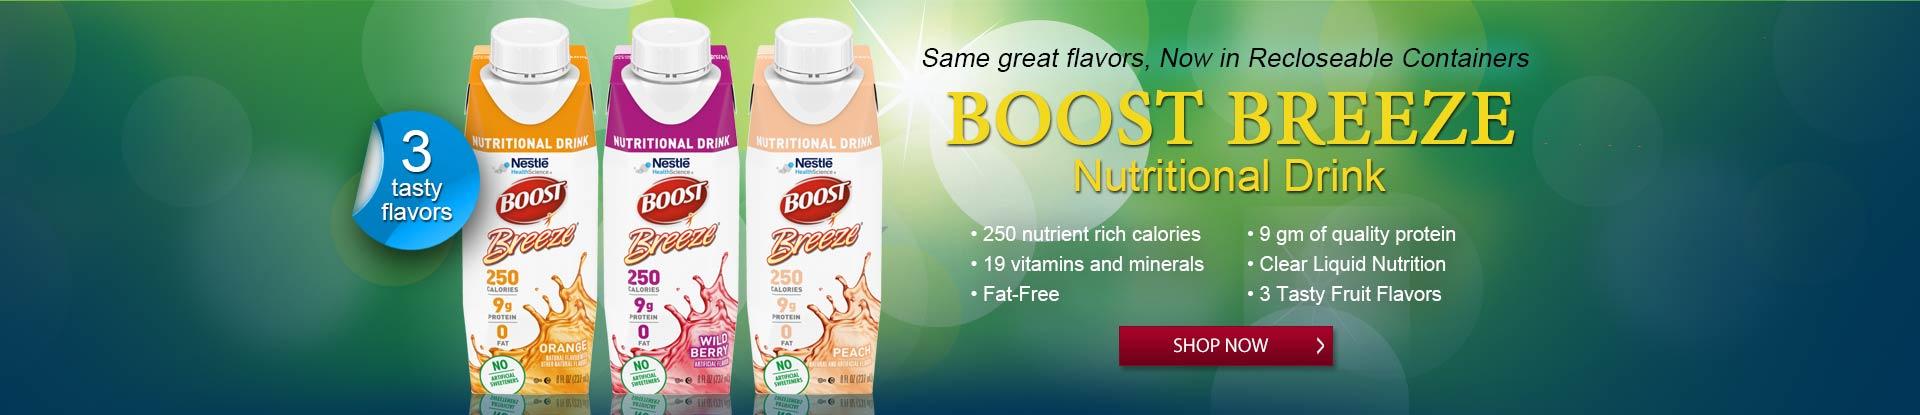 Boost Breeze Nutritional Drink